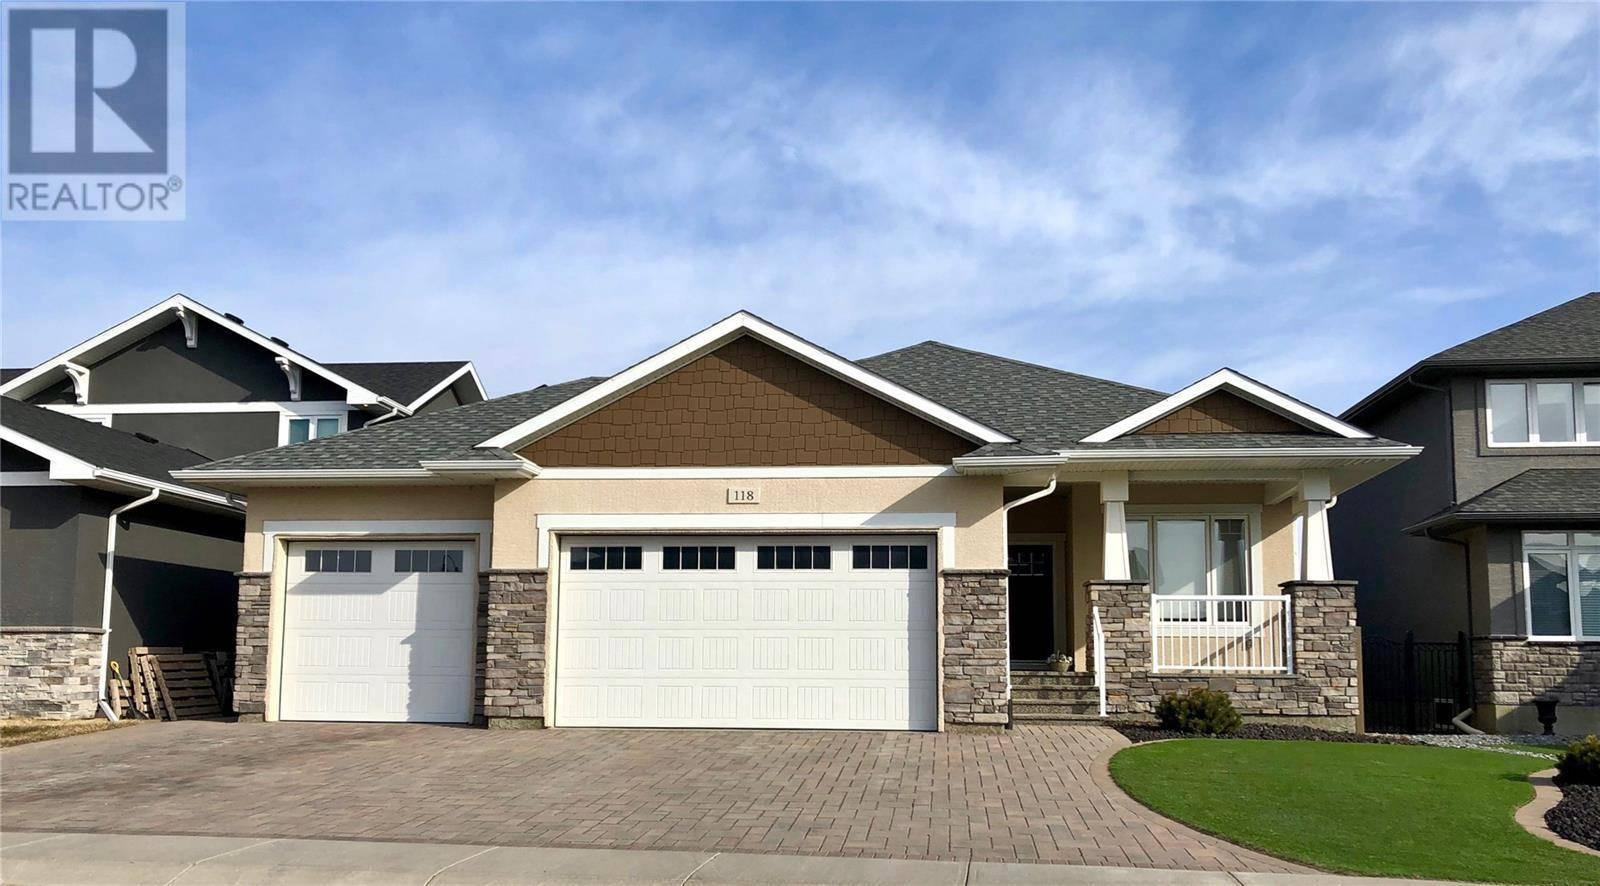 House for sale at 118 Warder Cv  Saskatoon Saskatchewan - MLS: SK785301